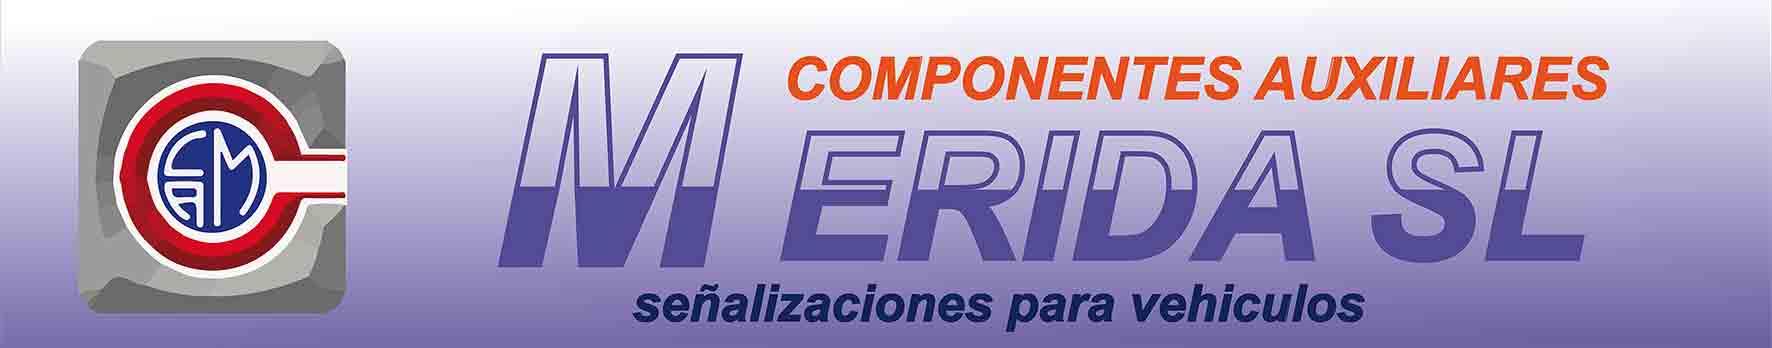 COMPONENTES AUXILIARES MERIDA SL